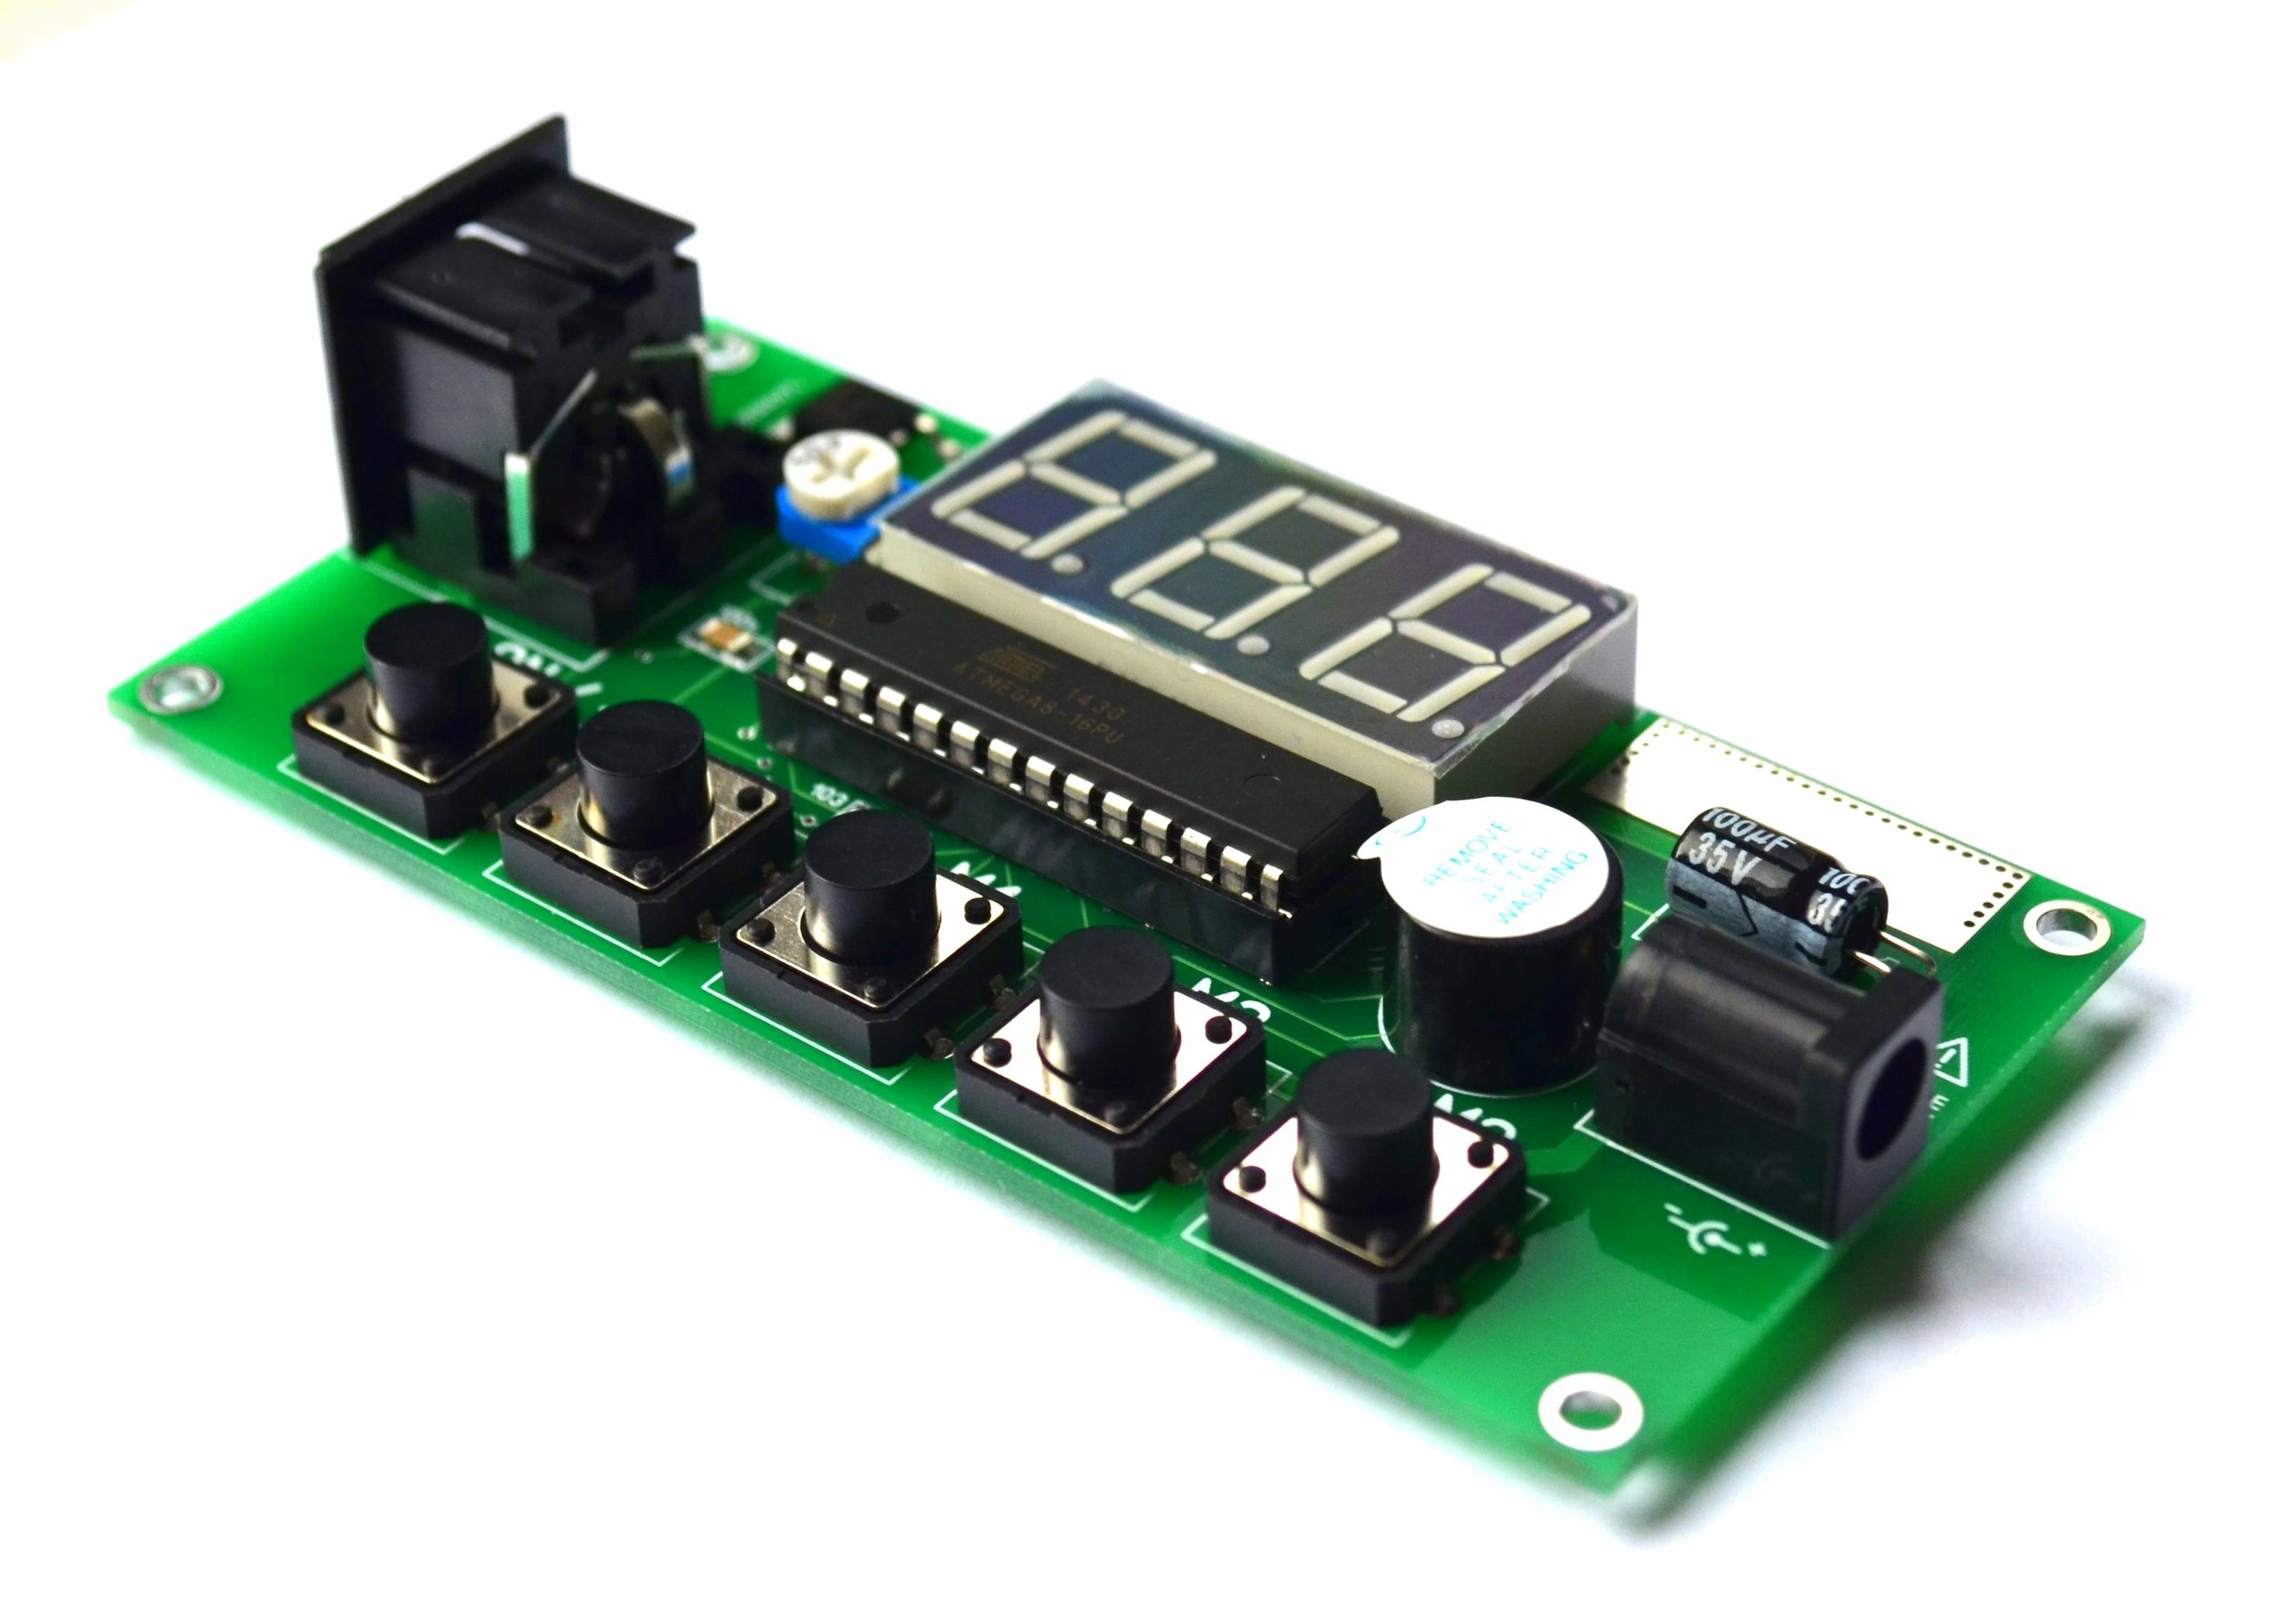 Digital Soldering Iron Controller Hakko 907 Esd From